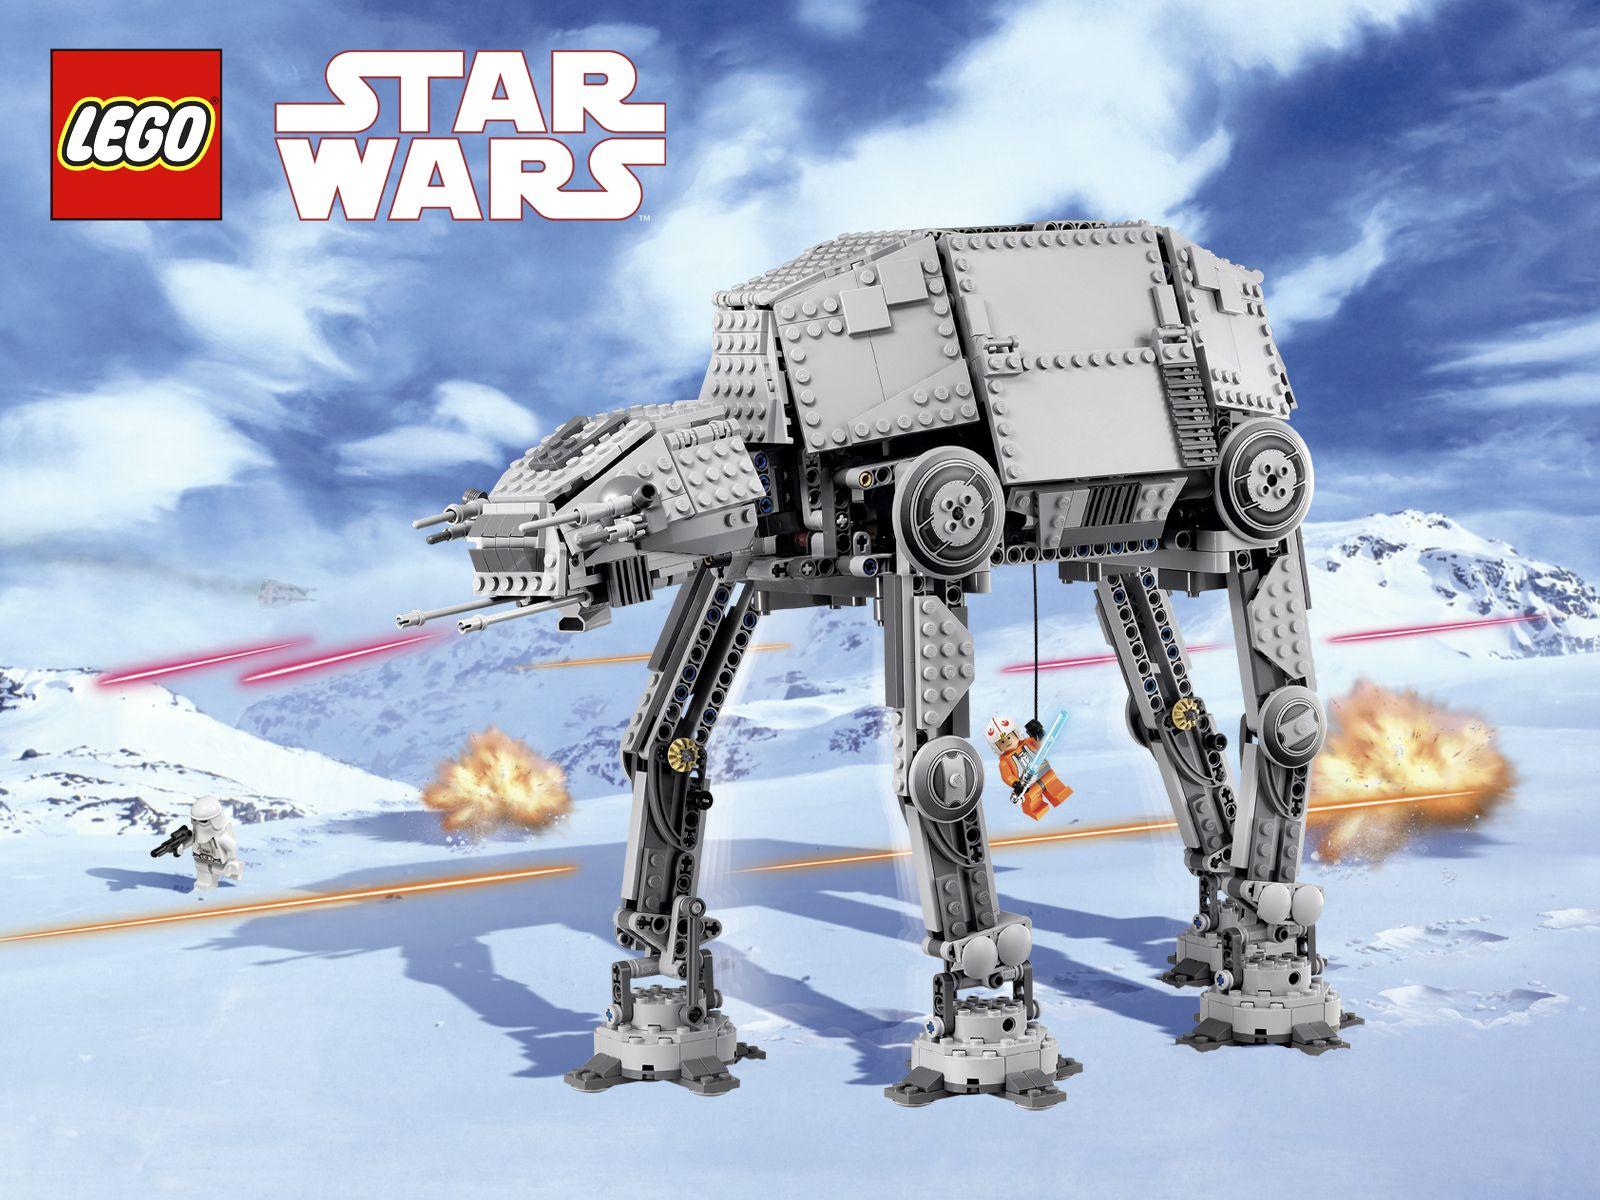 lego star wars wallpaper hd resolution | movies wallpapers